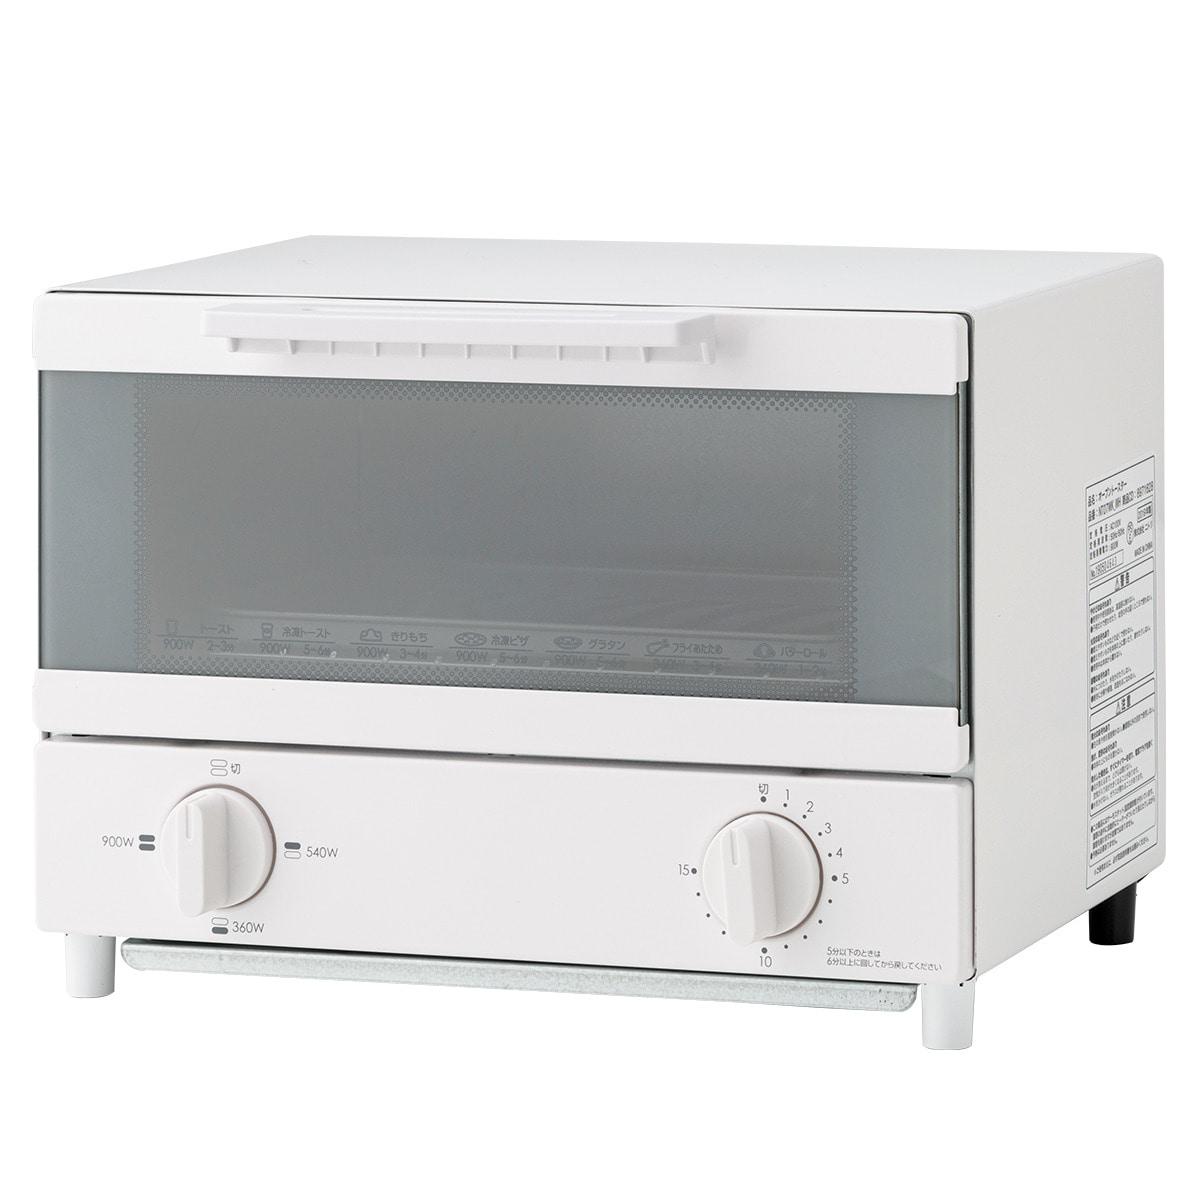 W切替式オーブントースター ココル(NT07WK_WH)